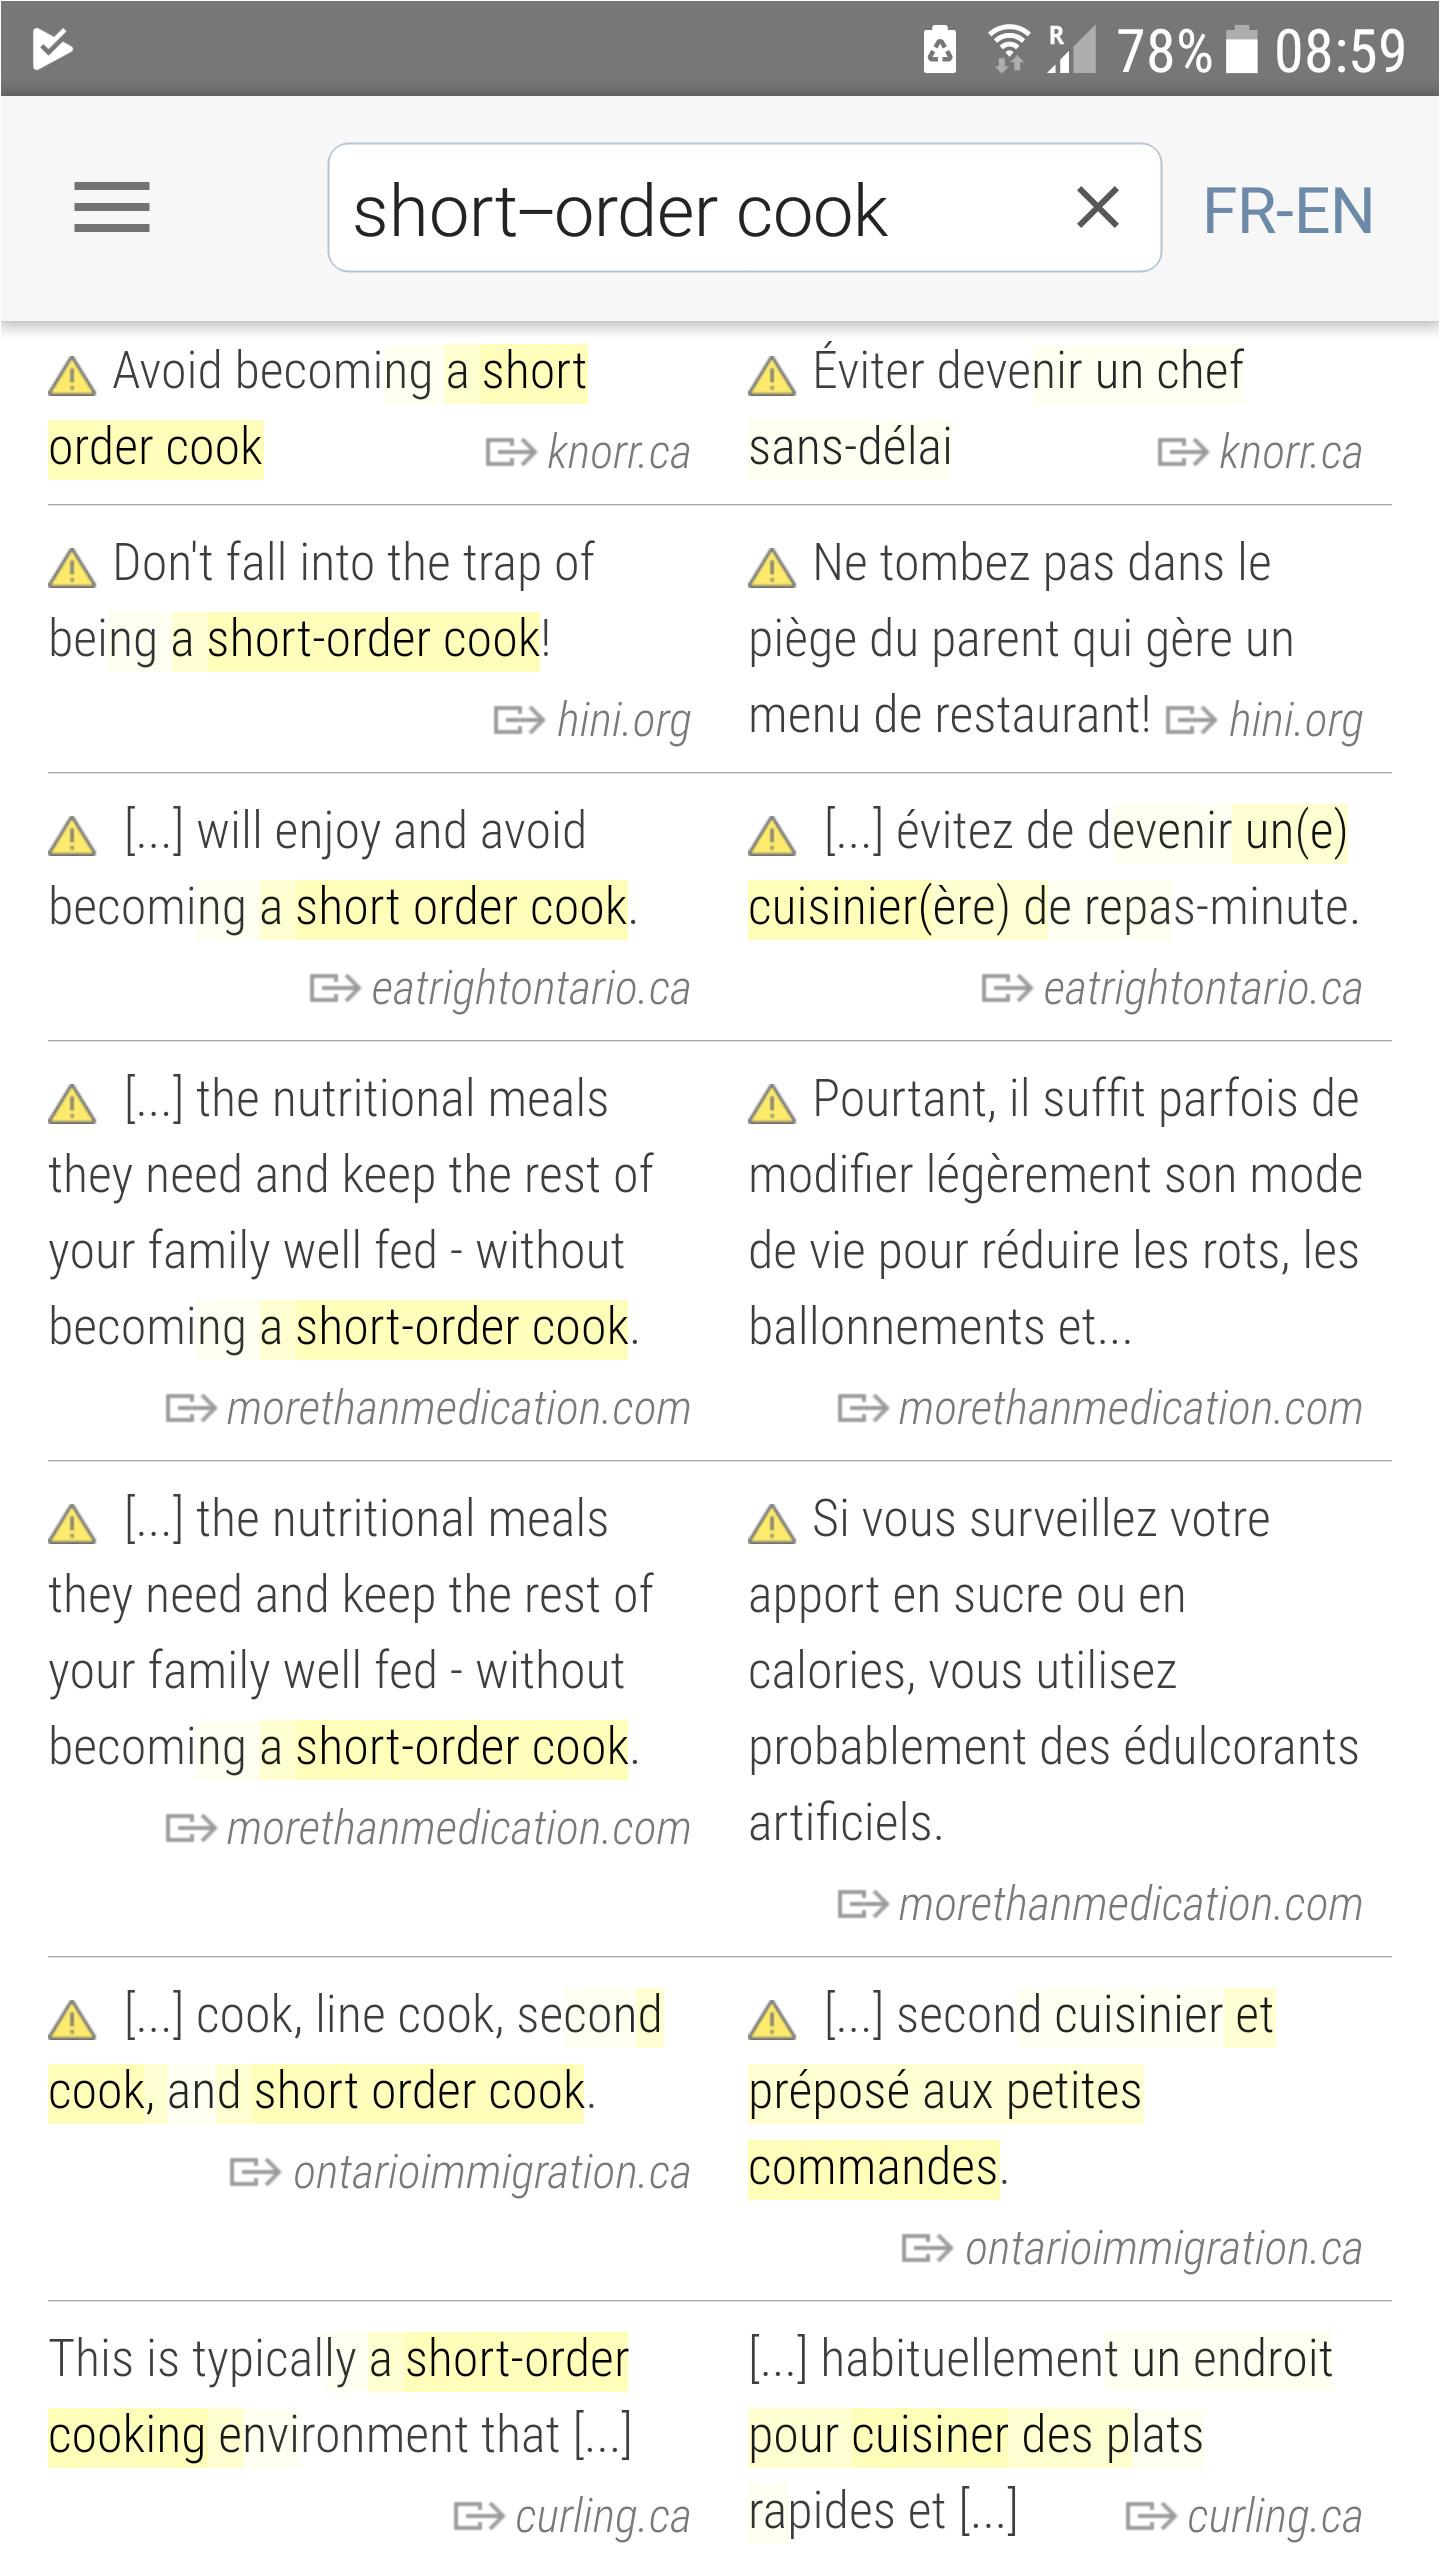 linguee short order cook png